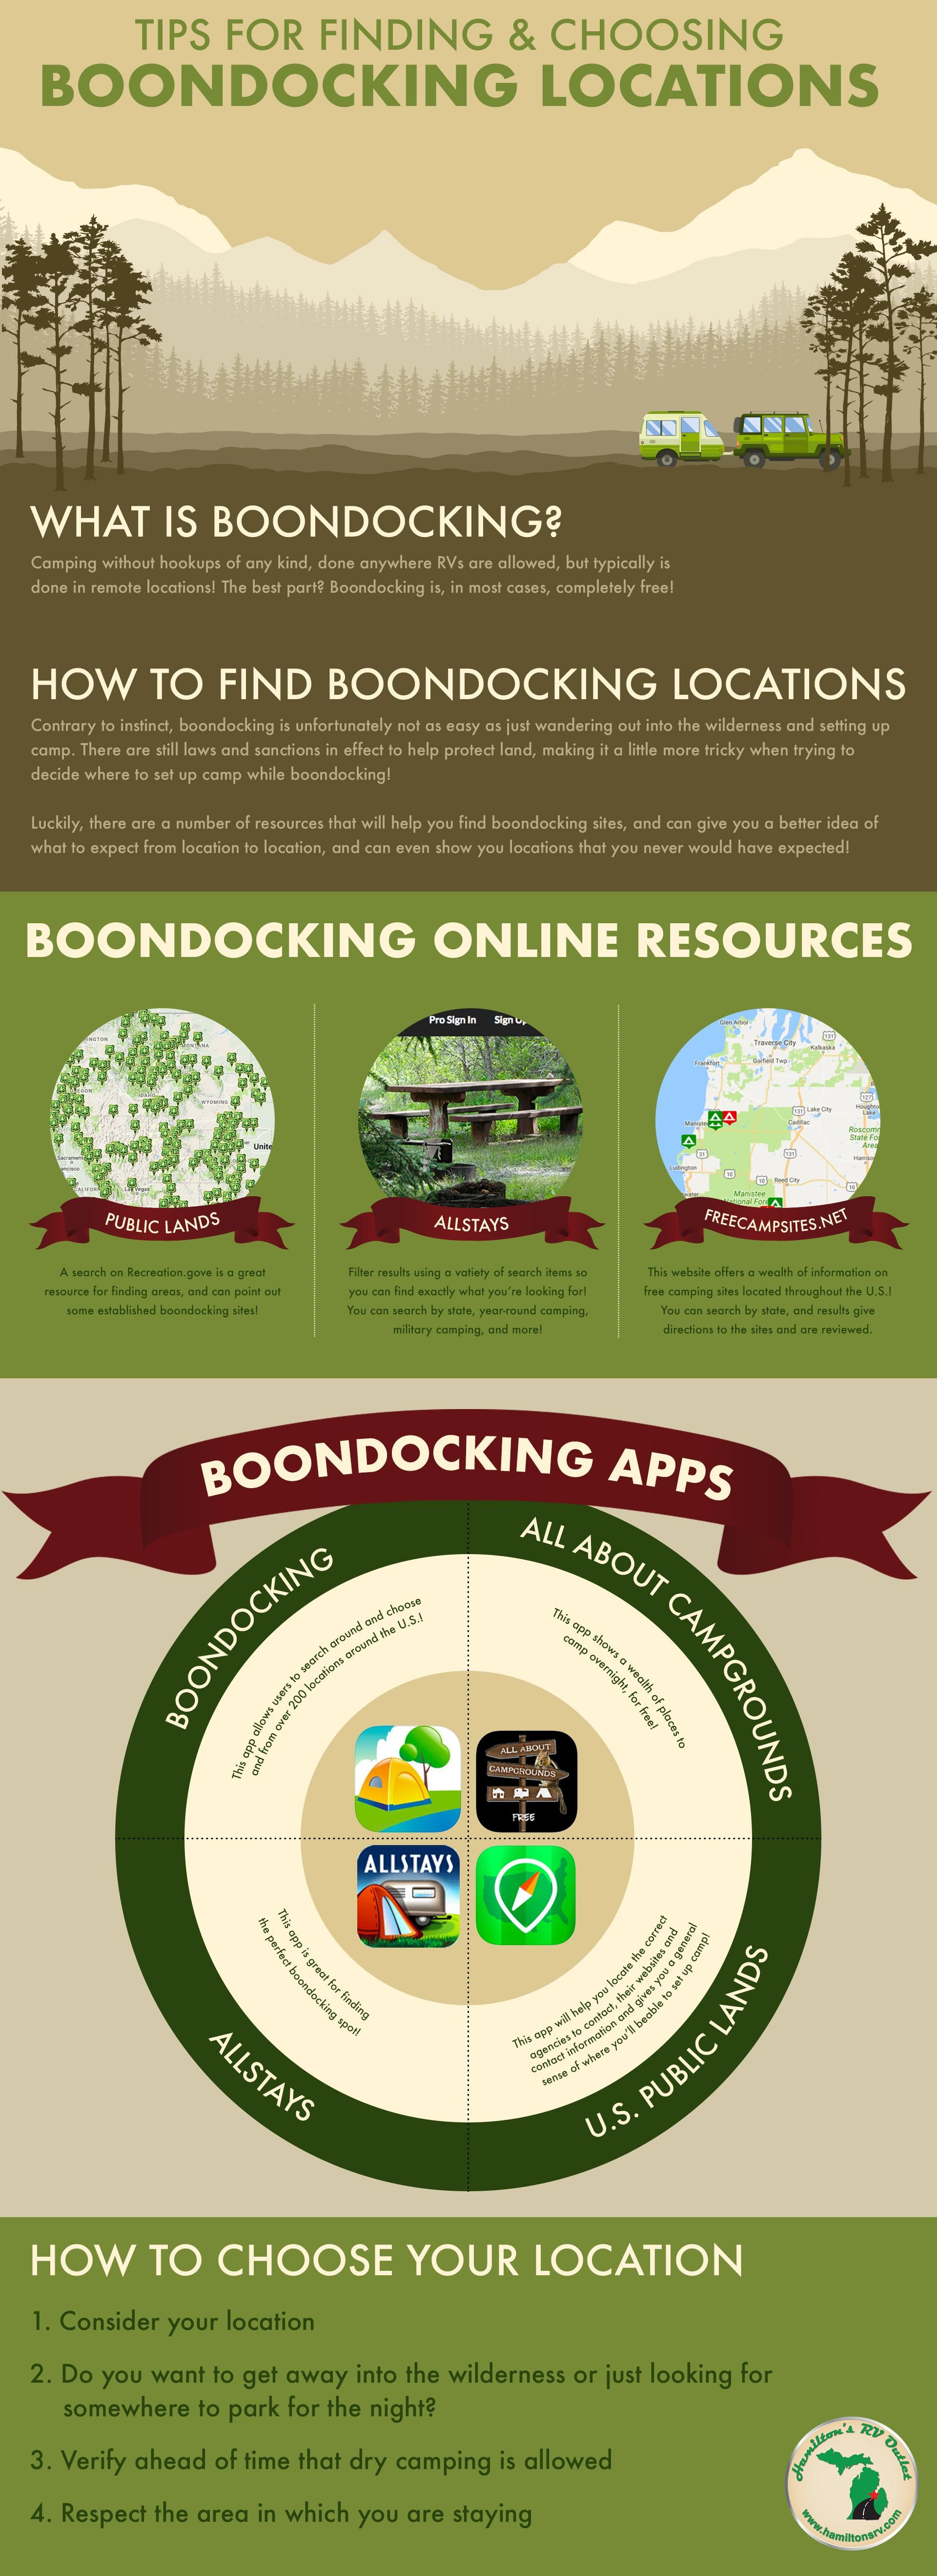 boondocking locations infographic